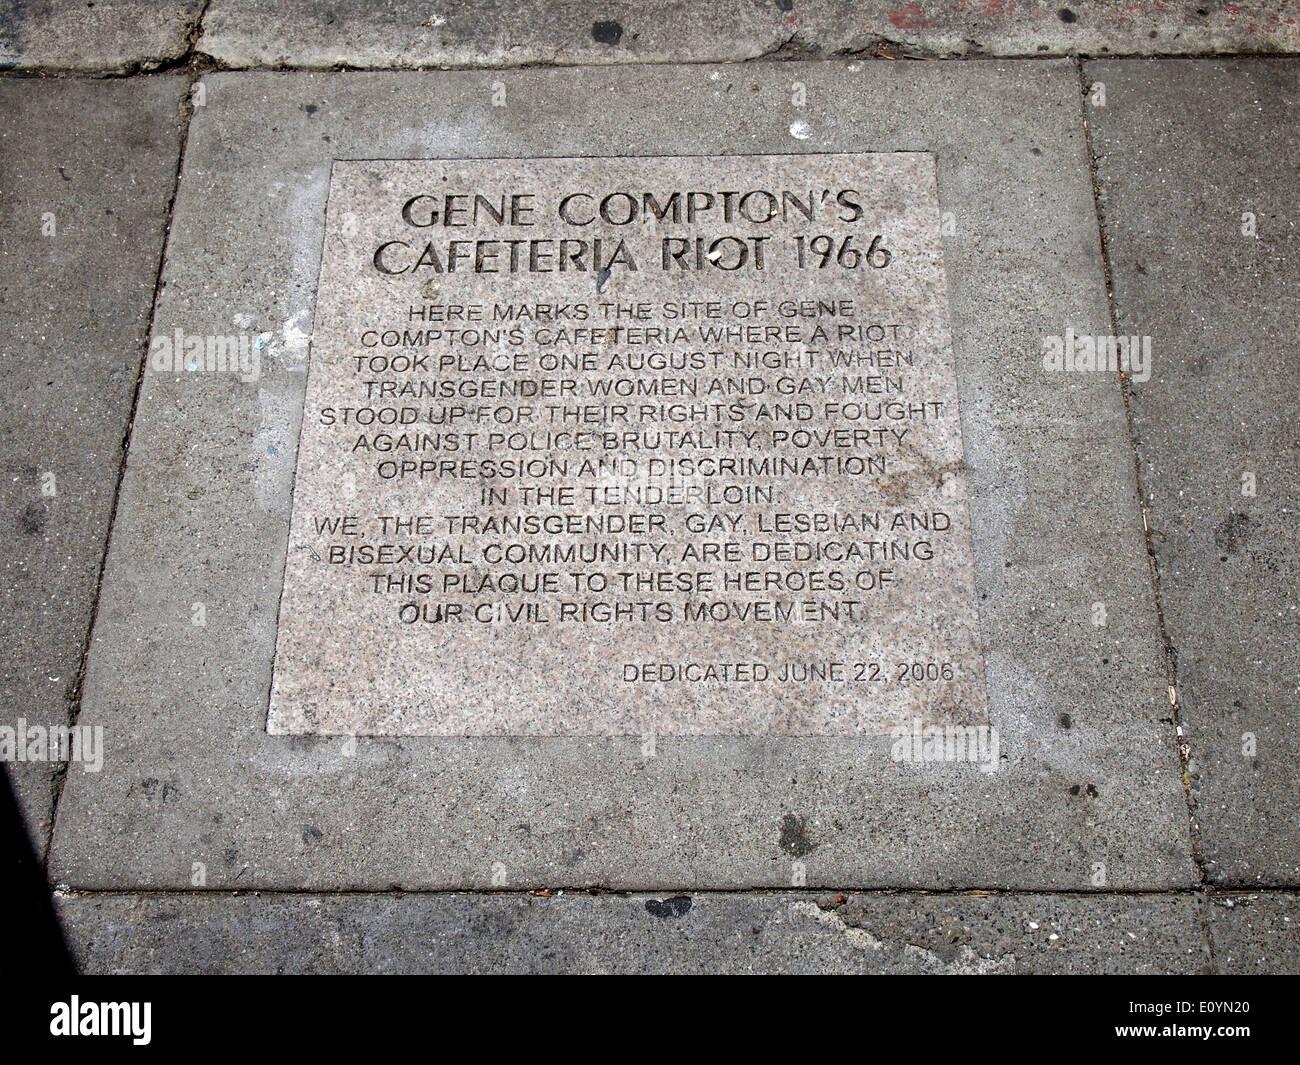 Compton's Cafeteria Riot 1966 plaque - Stock Image